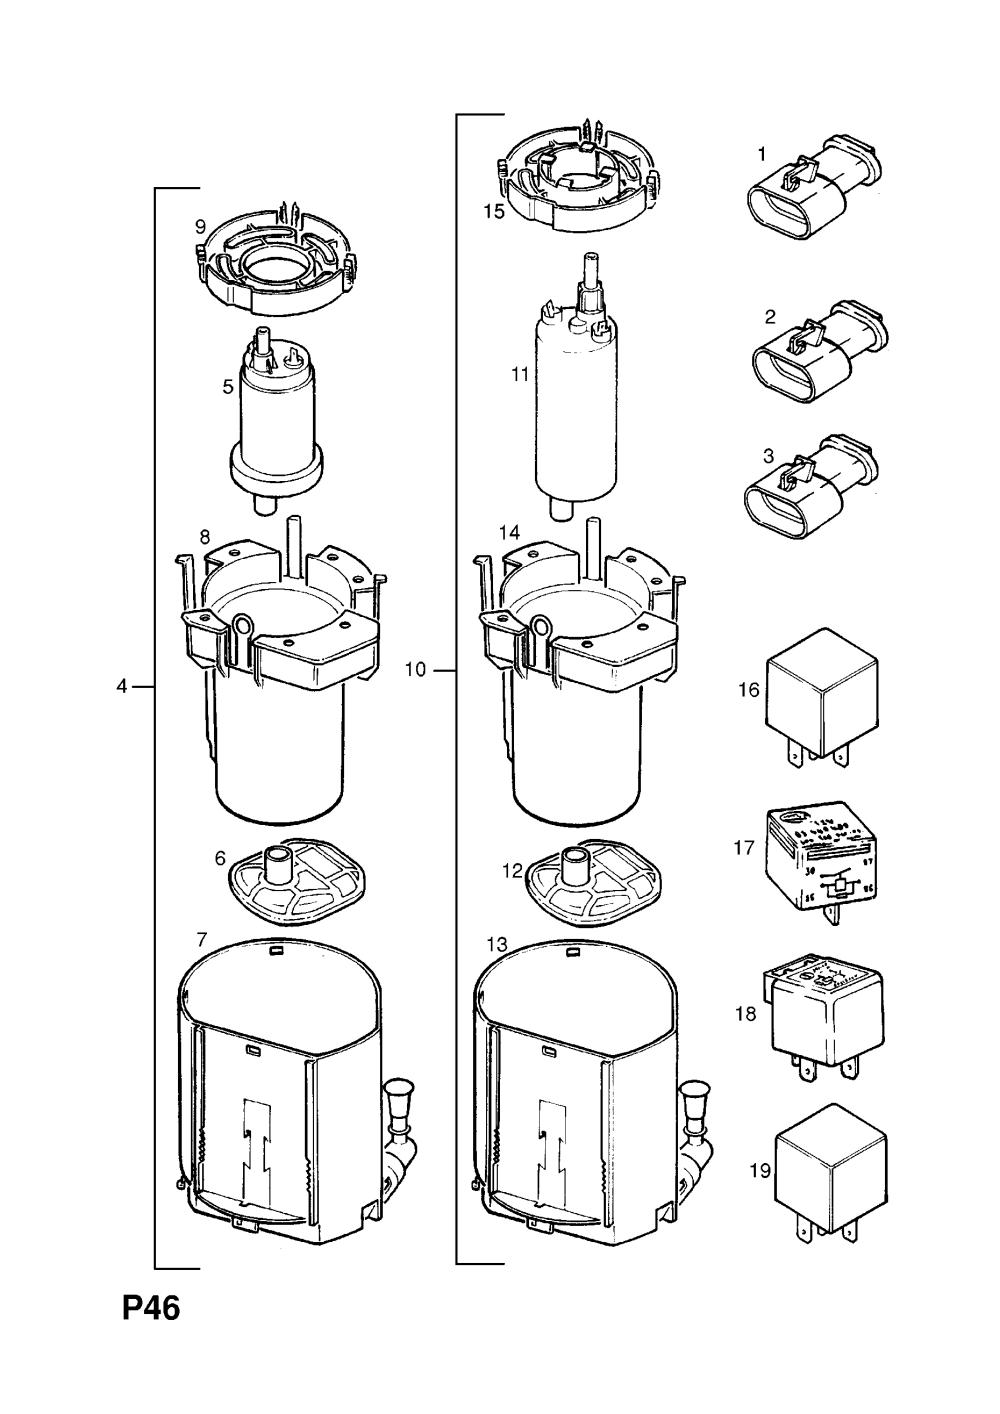 medium resolution of vauxhall fuel pump diagram wiring diagram compilationvauxhall fuel pump diagram wiring diagrams konsult vauxhall corsa b